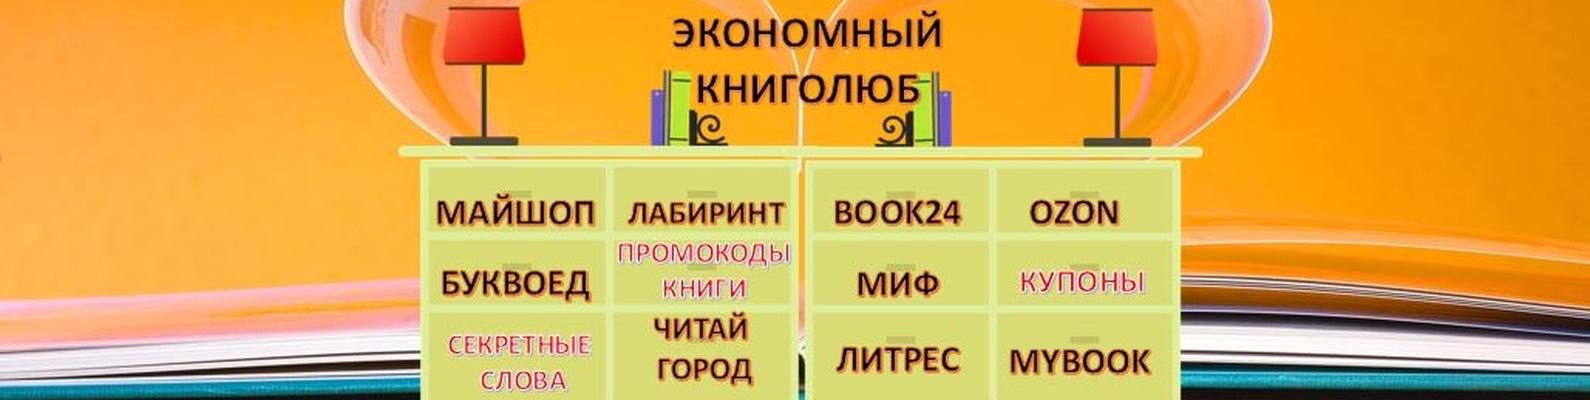 73450daaacf ЭКОНОМНЫЙ КНИГОЛЮБ